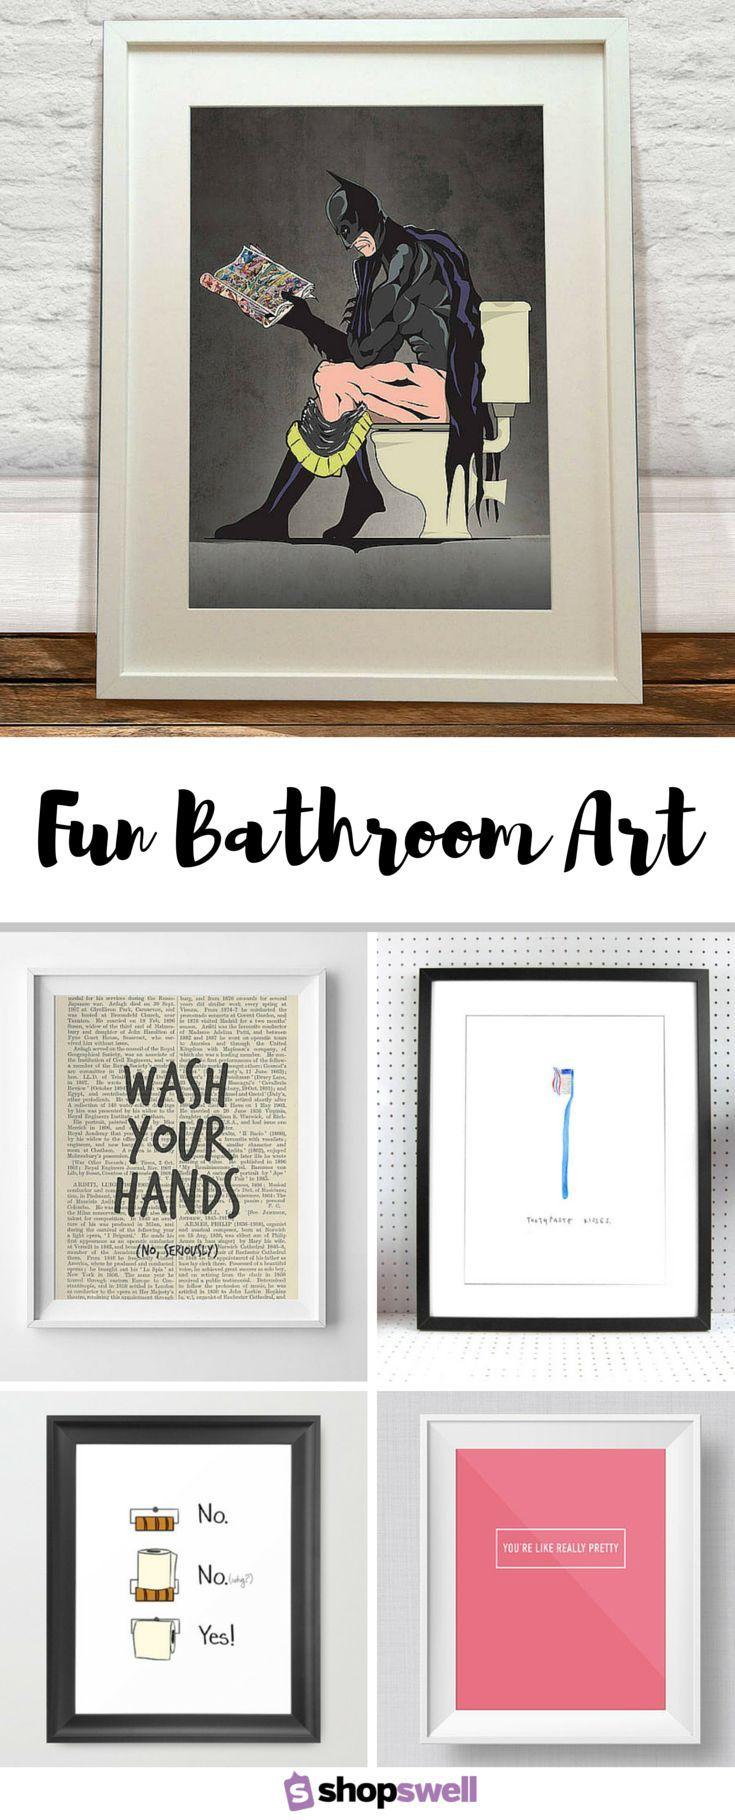 Fun Bathroom Art Shopswell Bathroom Art Bathroom Wall Art Amazing Bathrooms